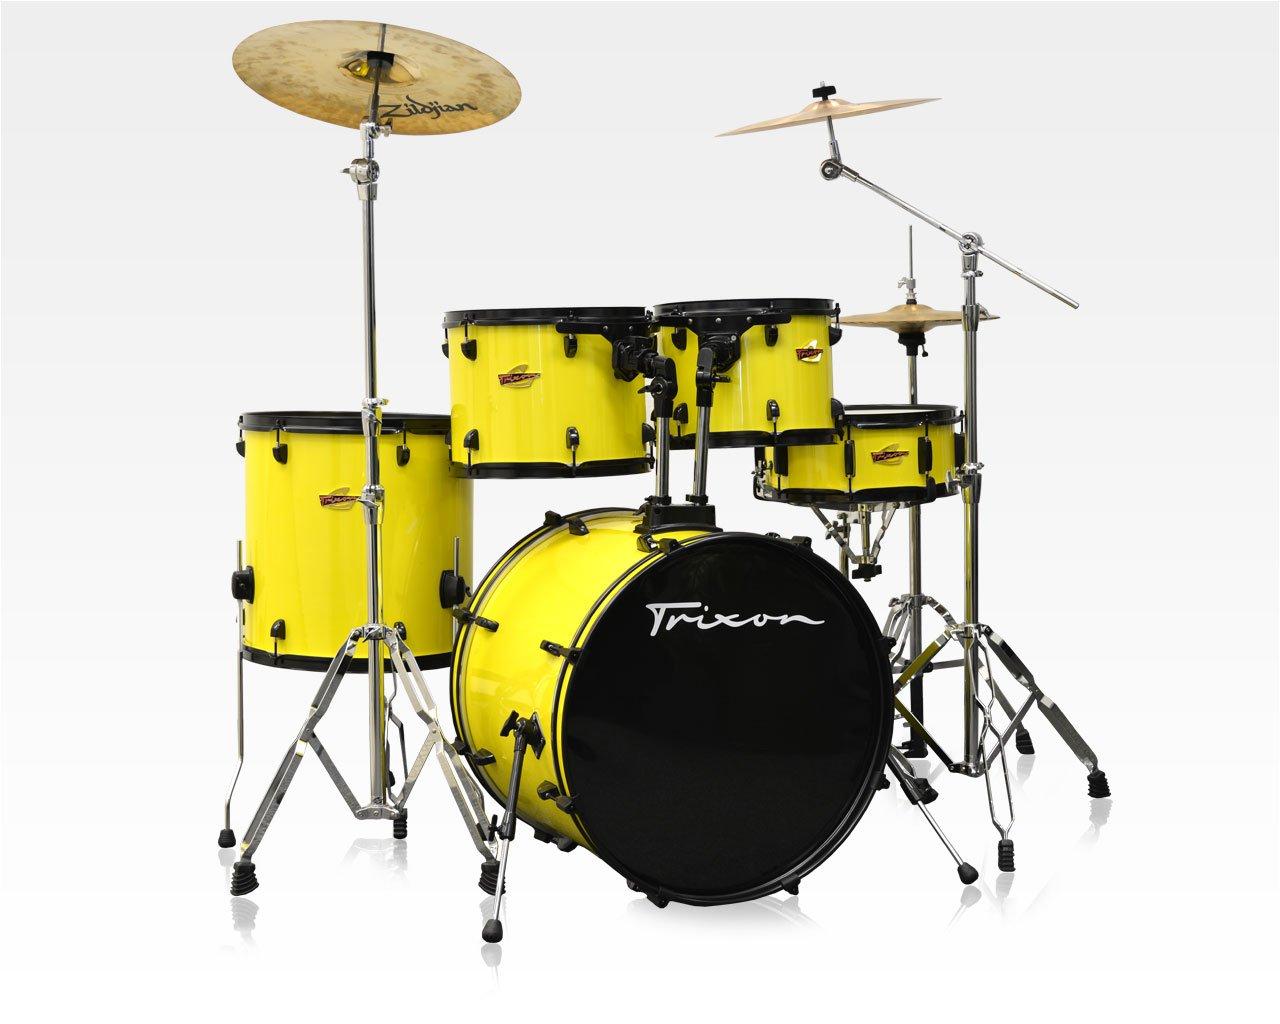 Trixon 2014 5-Piece Birch Kit - Yellow Jacket